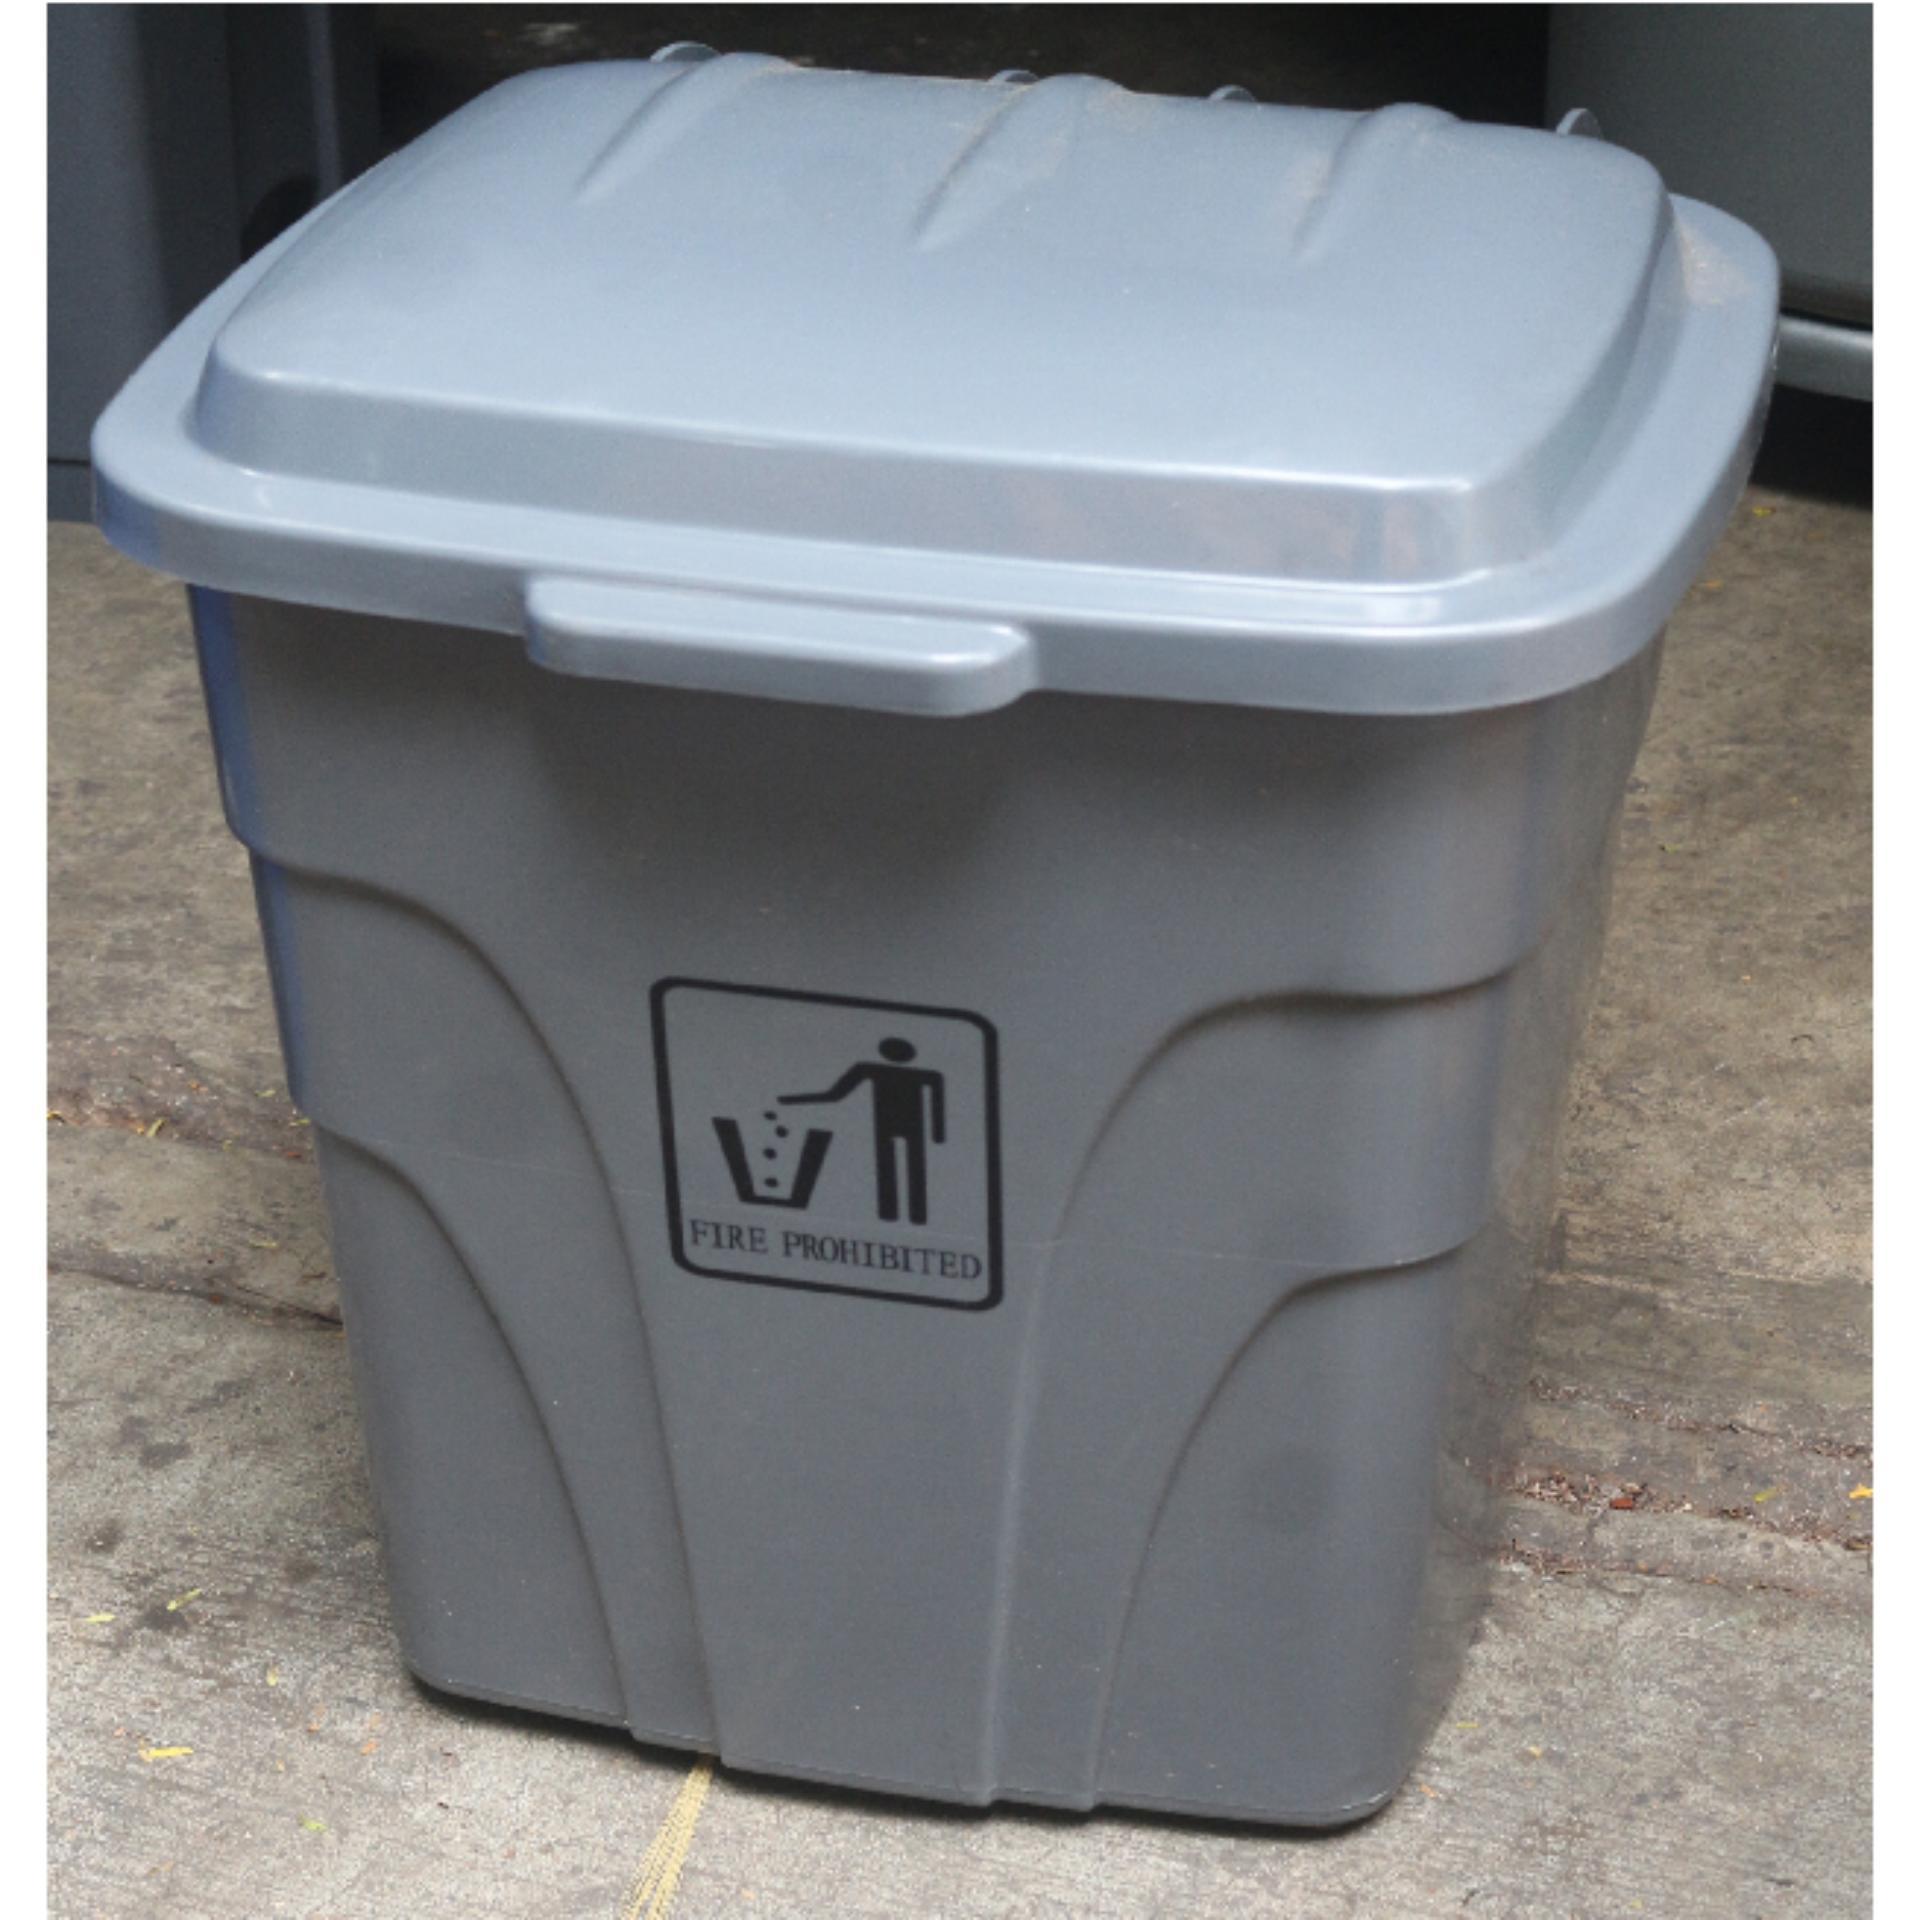 Stock Photo Three Color Coded Trash Bin For Waste Segregation